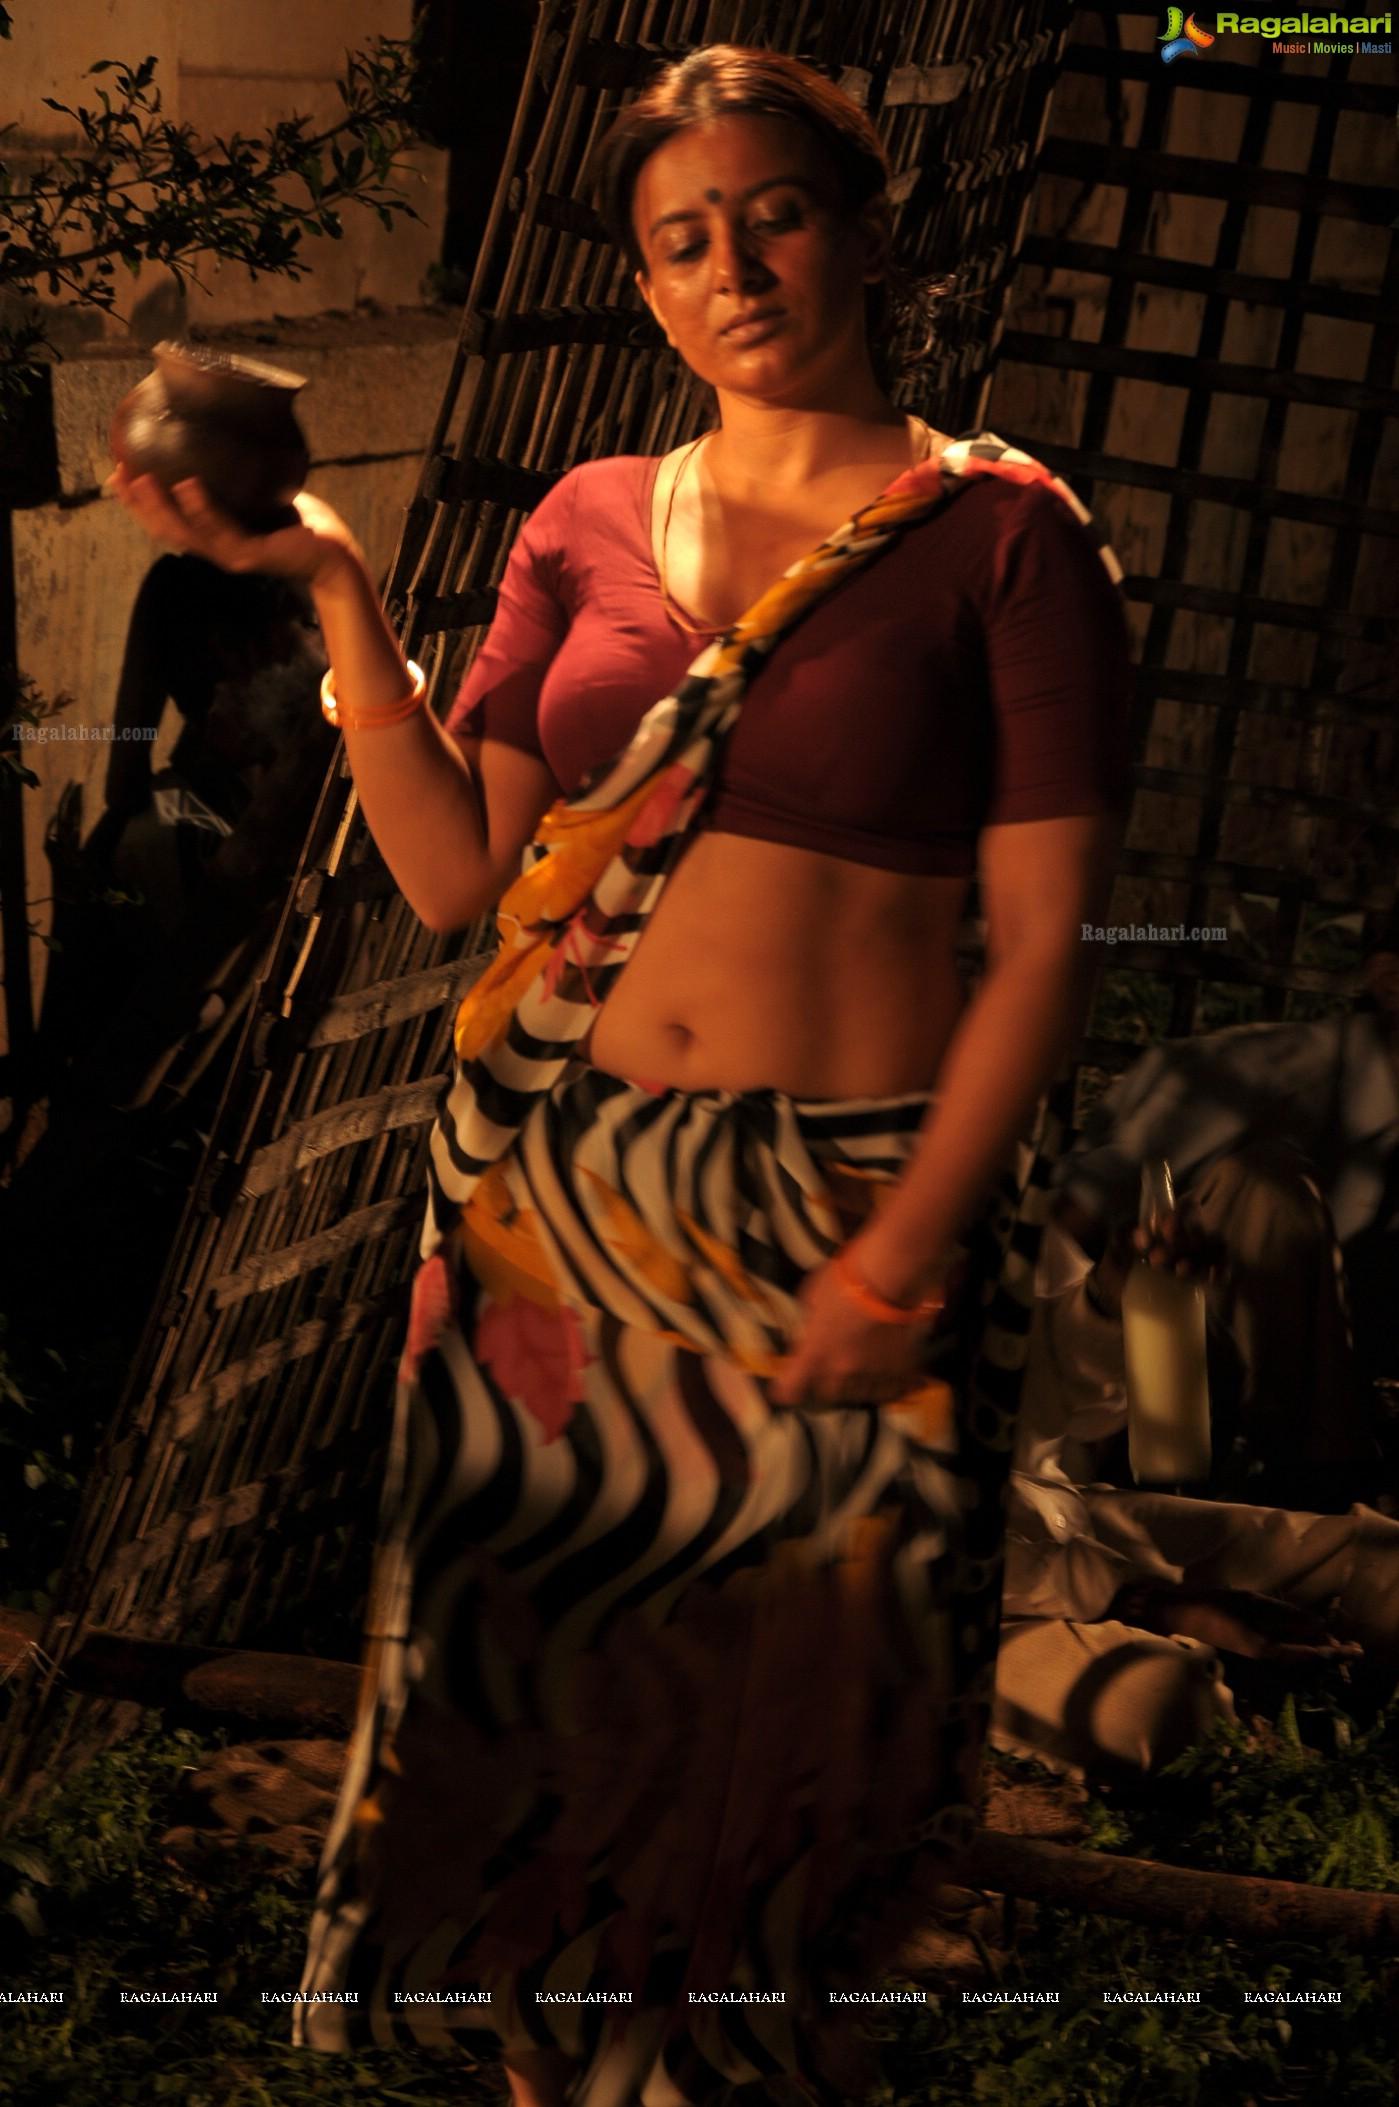 Watch Sanjana Gandhi (now Pooja Gandhi) video